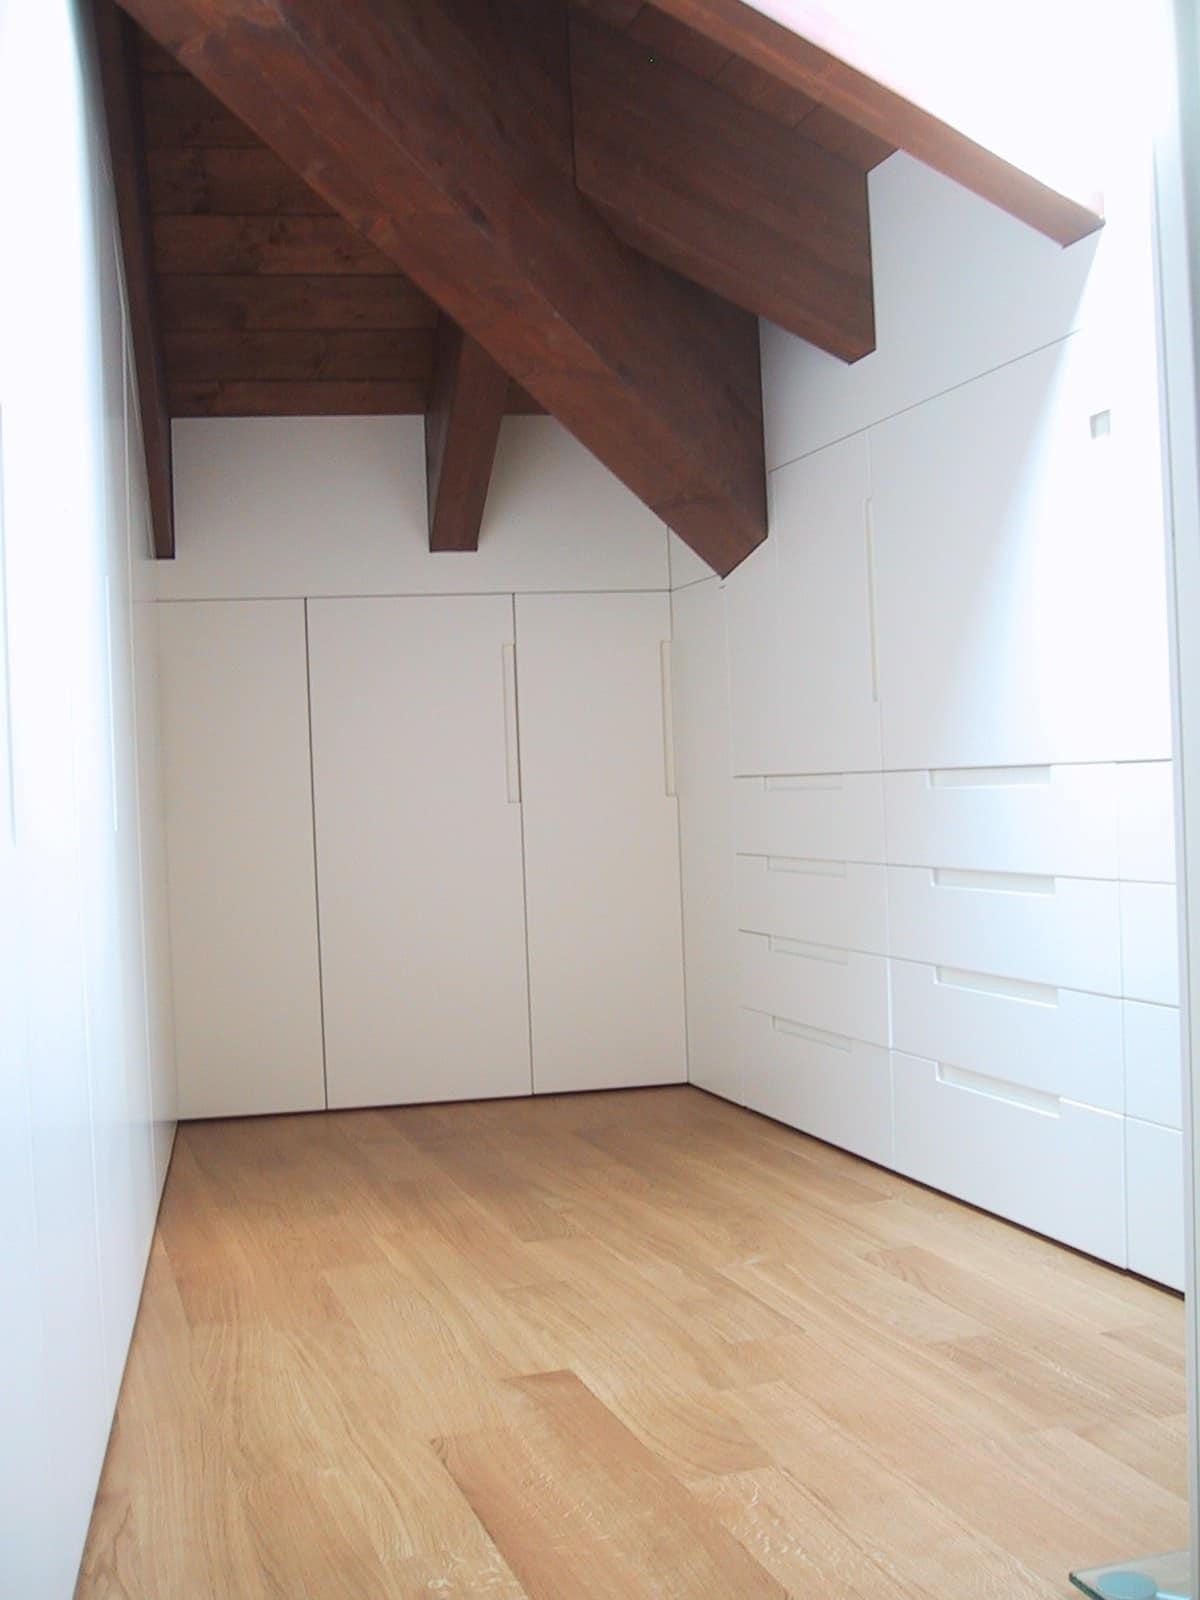 Armadio in legno laccato bianco per mansarda idfdesign - Mobili per mansarde ikea ...